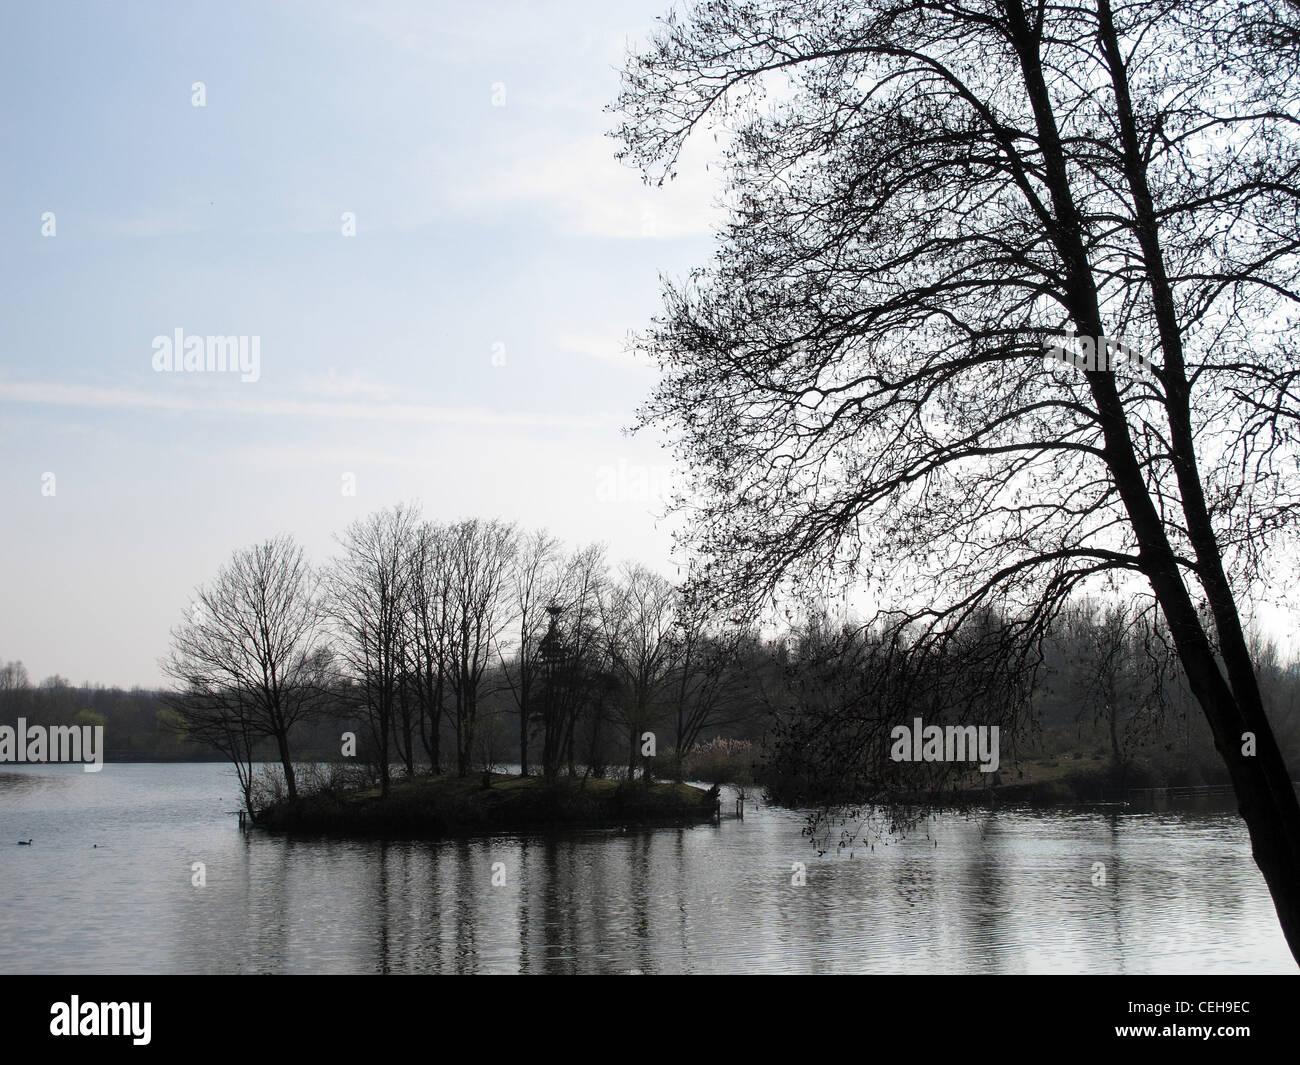 Winter scene on Arrow Valley Lake, Redditch, stark trees against a blue sky - Stock Image